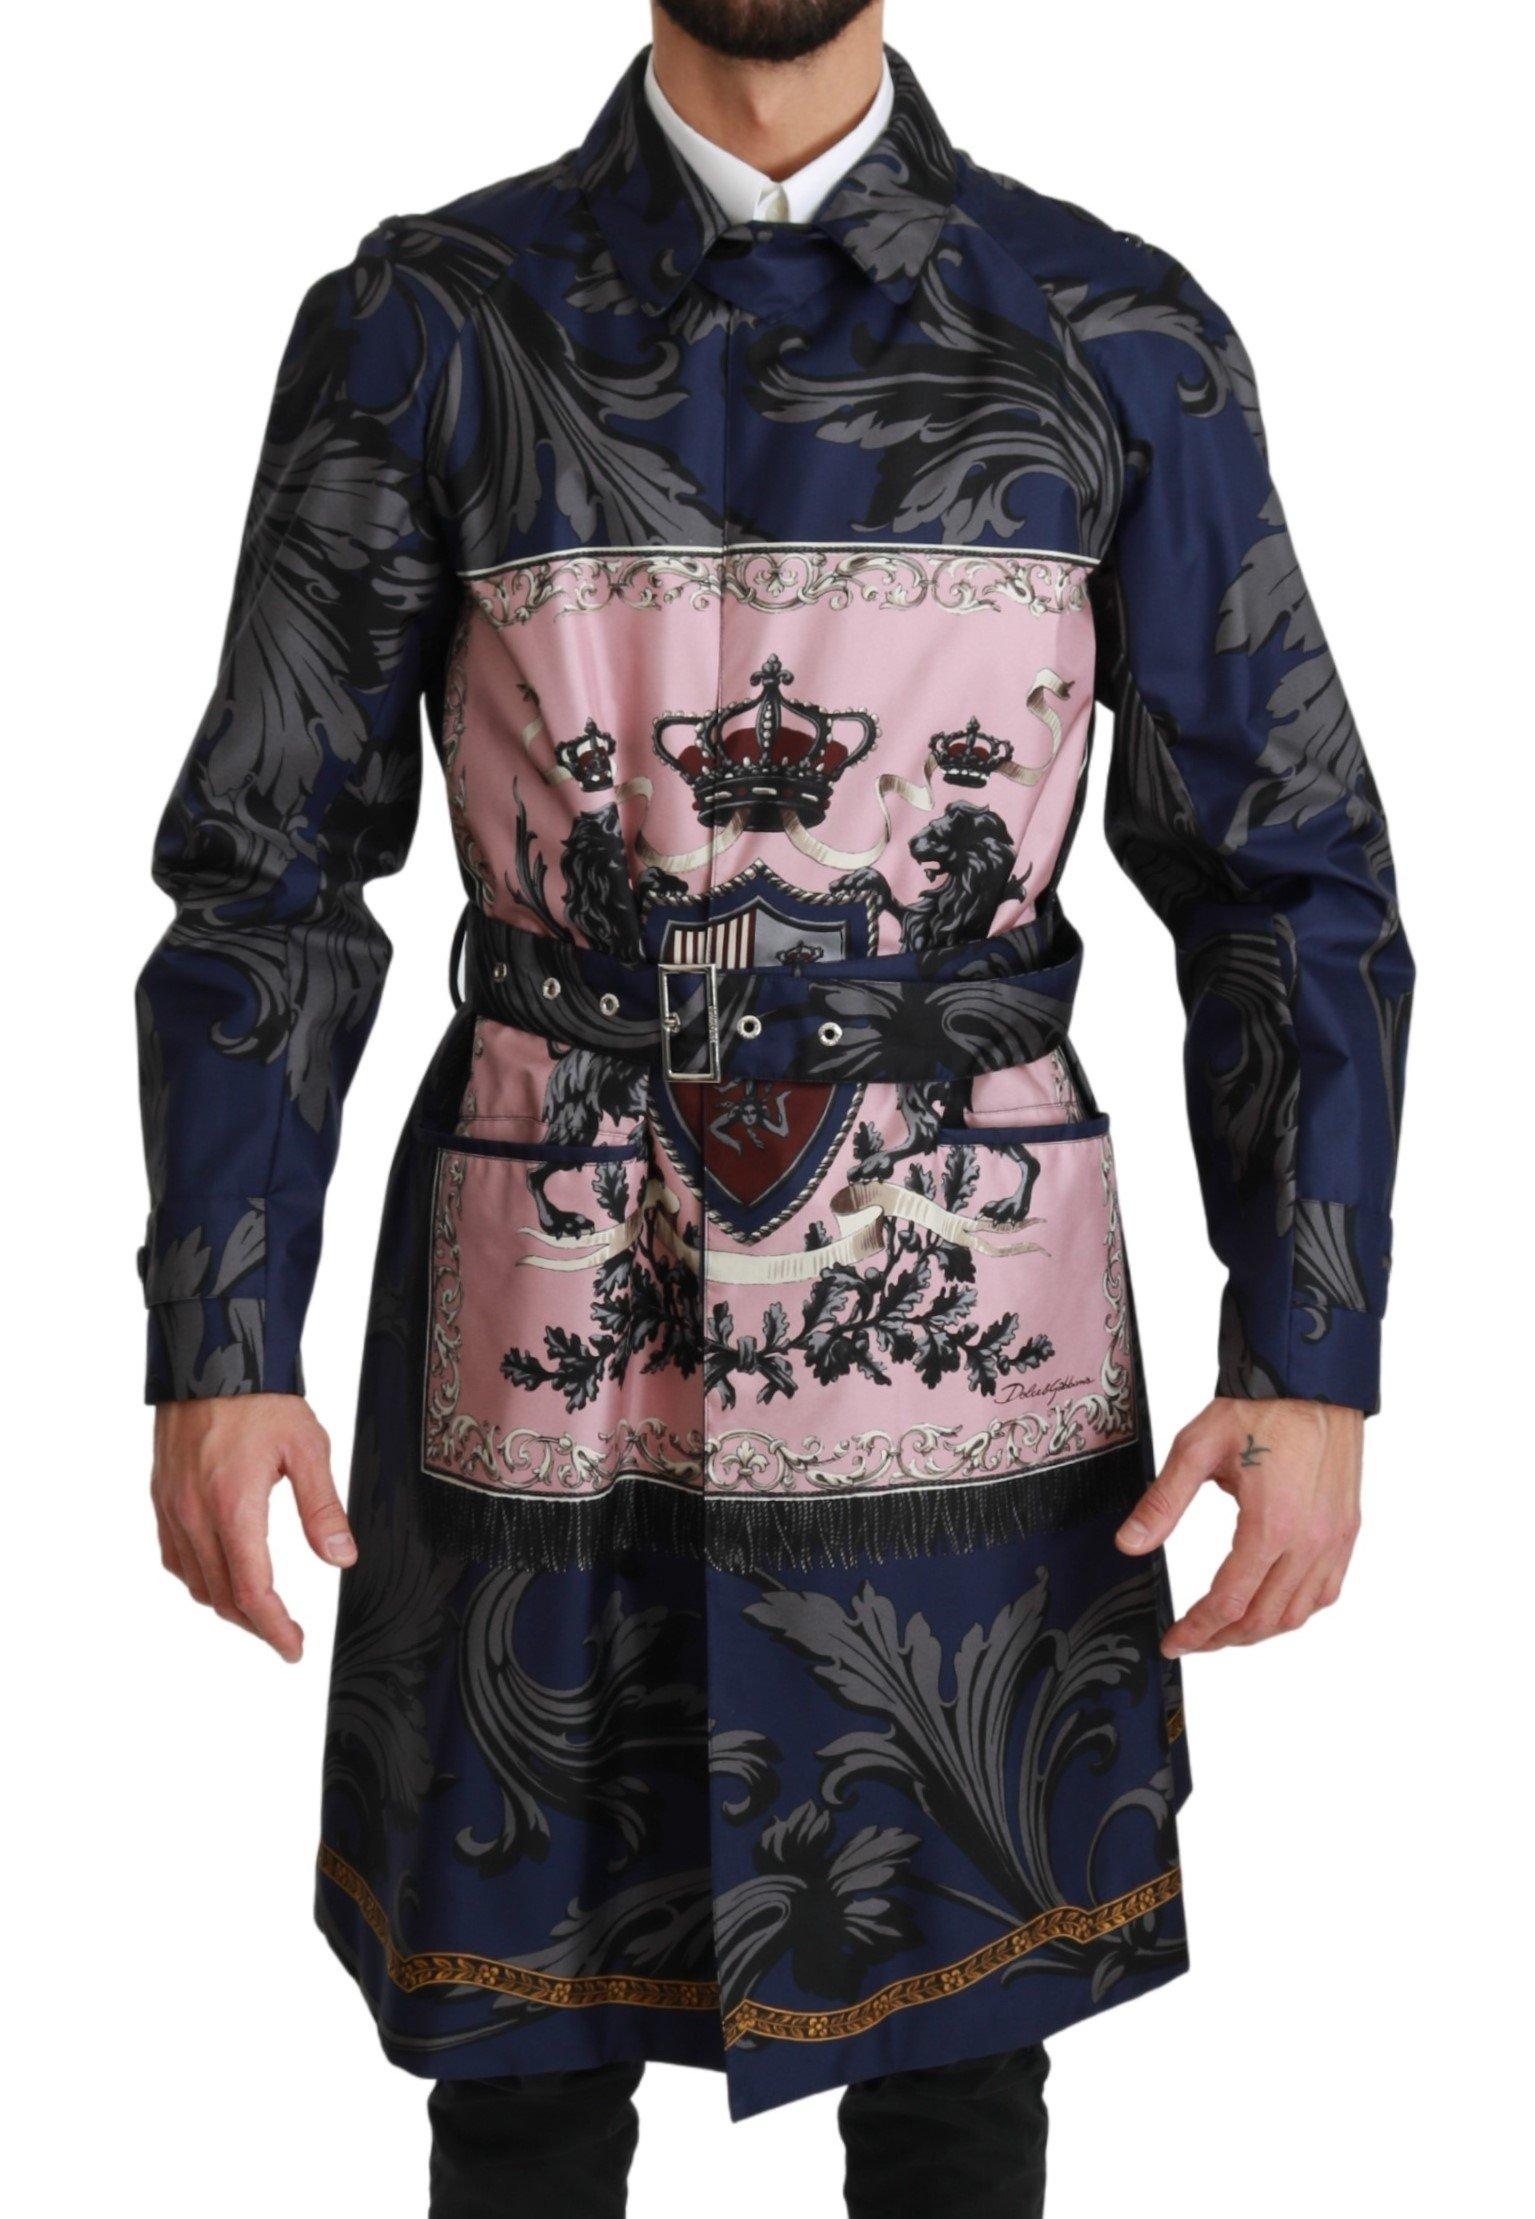 Dolce & Gabbana Men's Royal Crown Trenchcoat Silk Jacket Blue JKT2597 - IT44 | XS